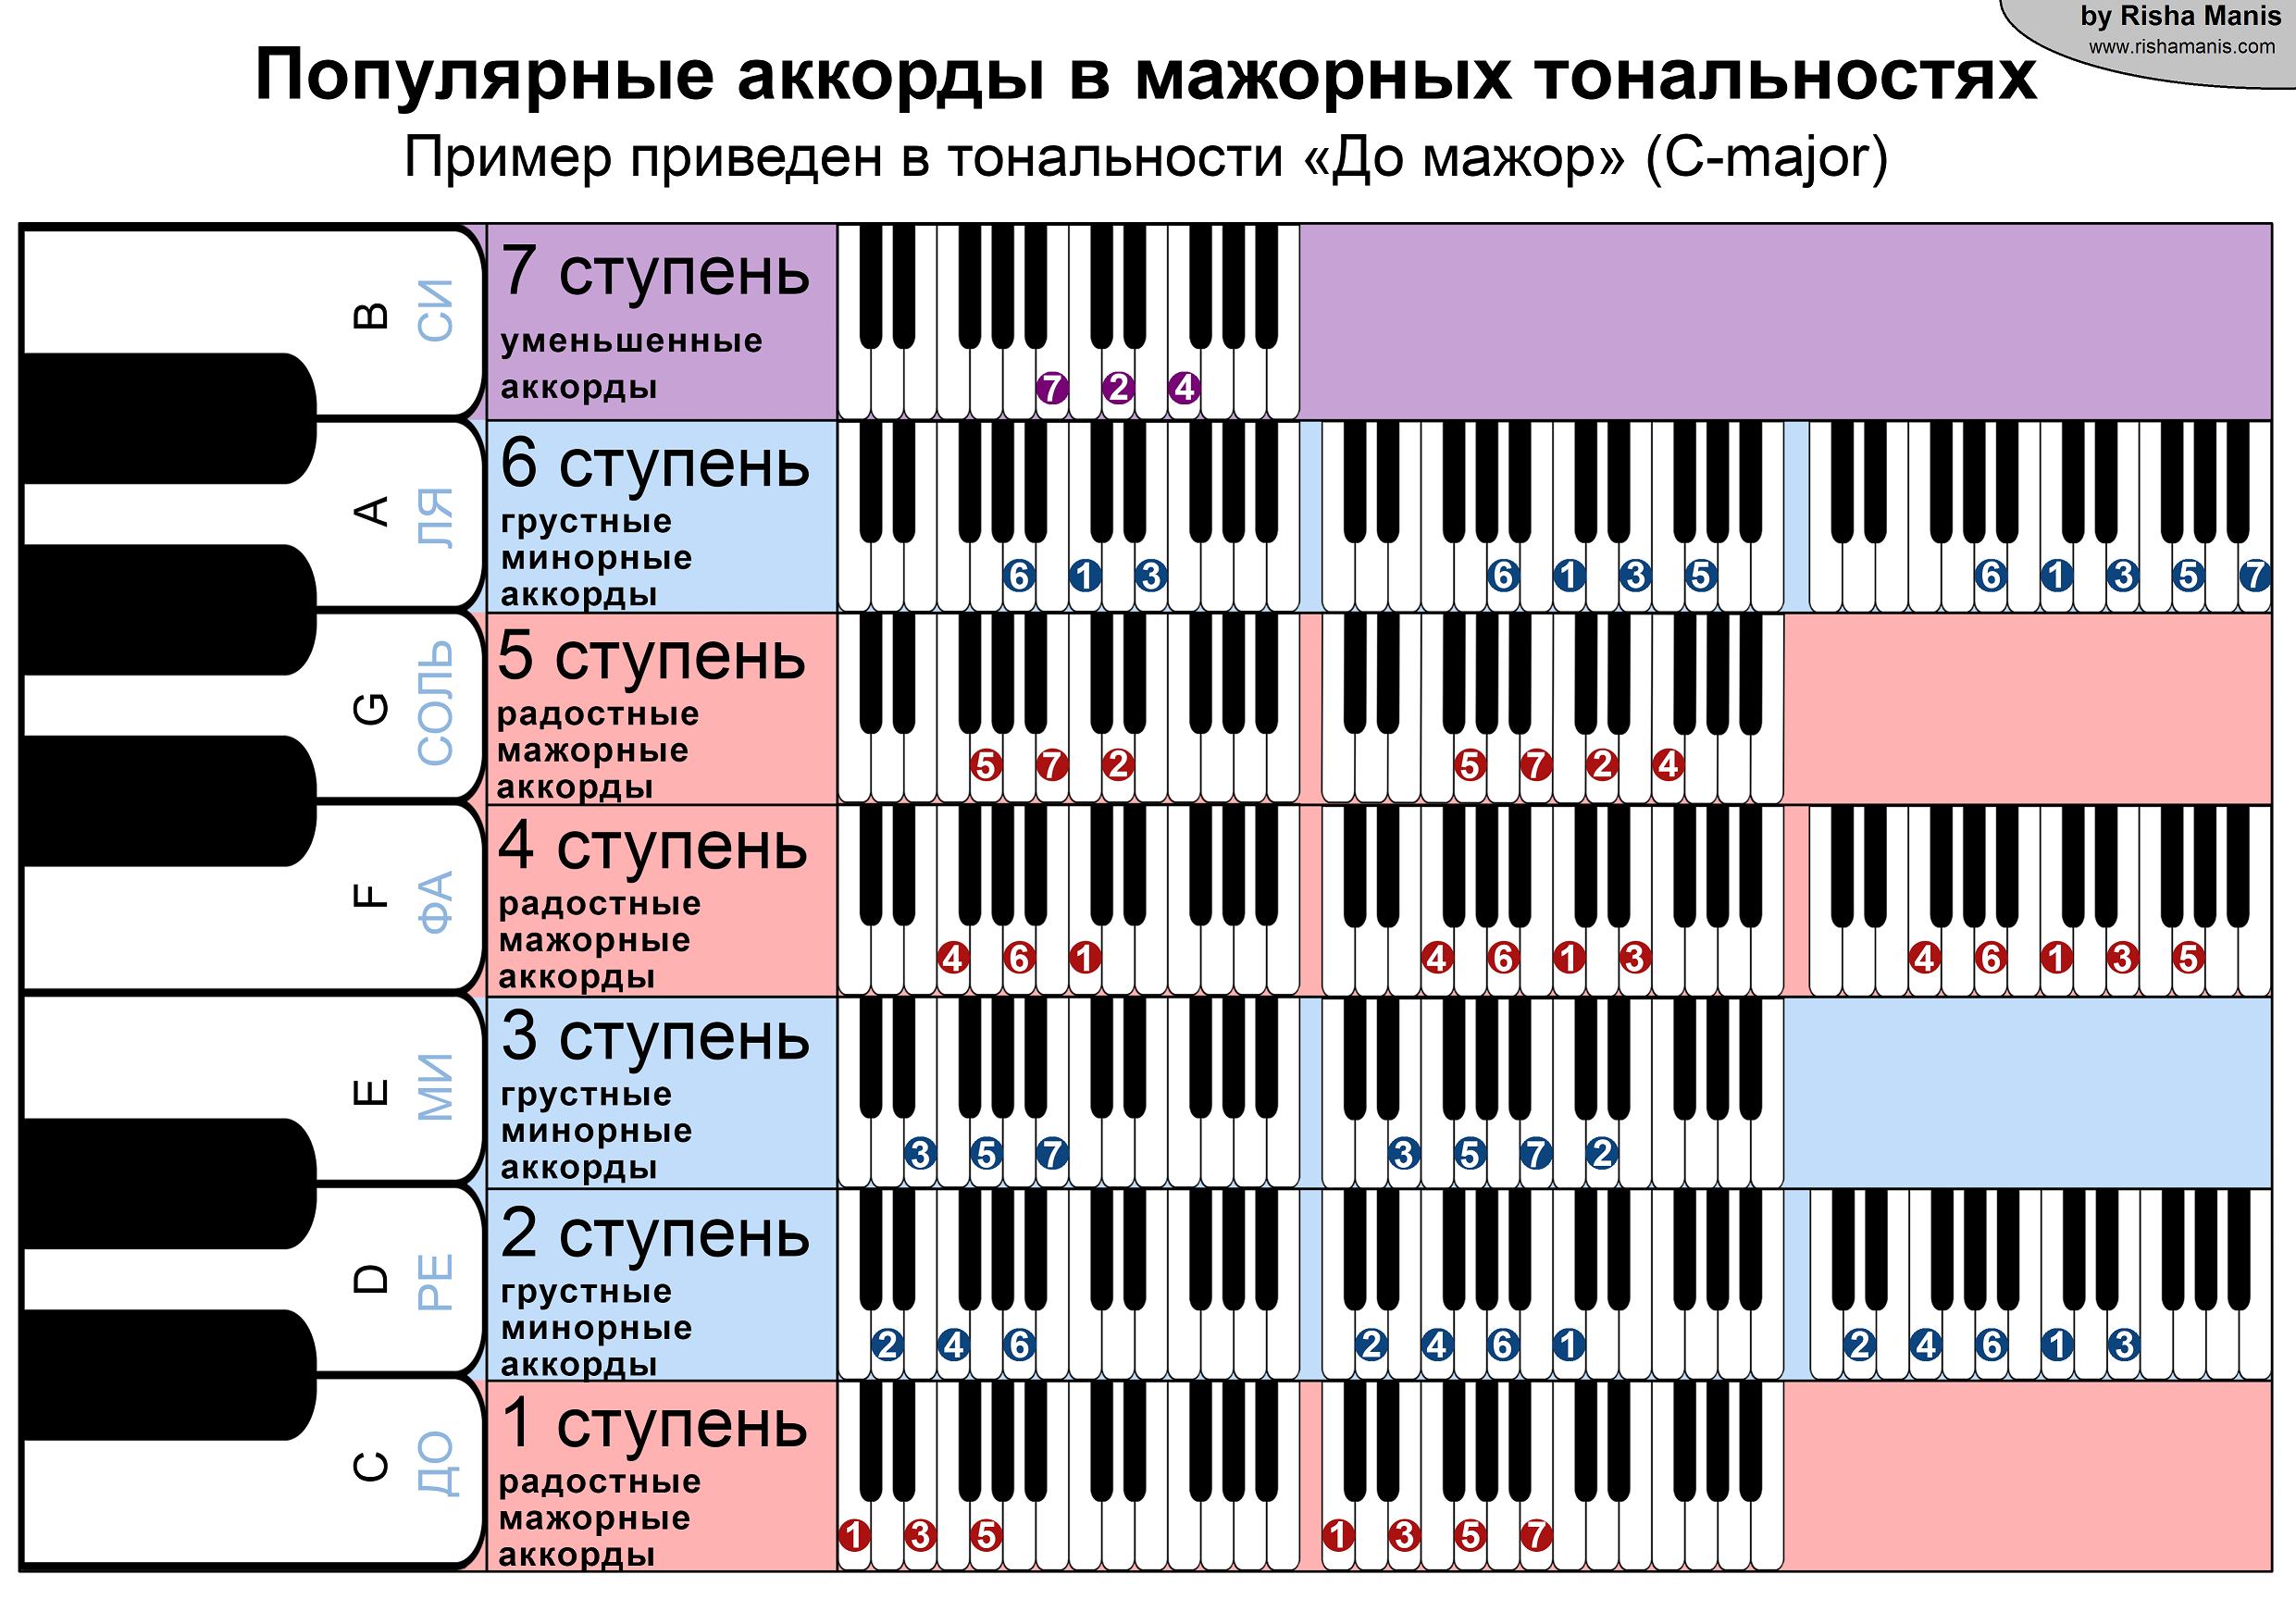 Popularnye akkordy v majornyh tonalnostjah small